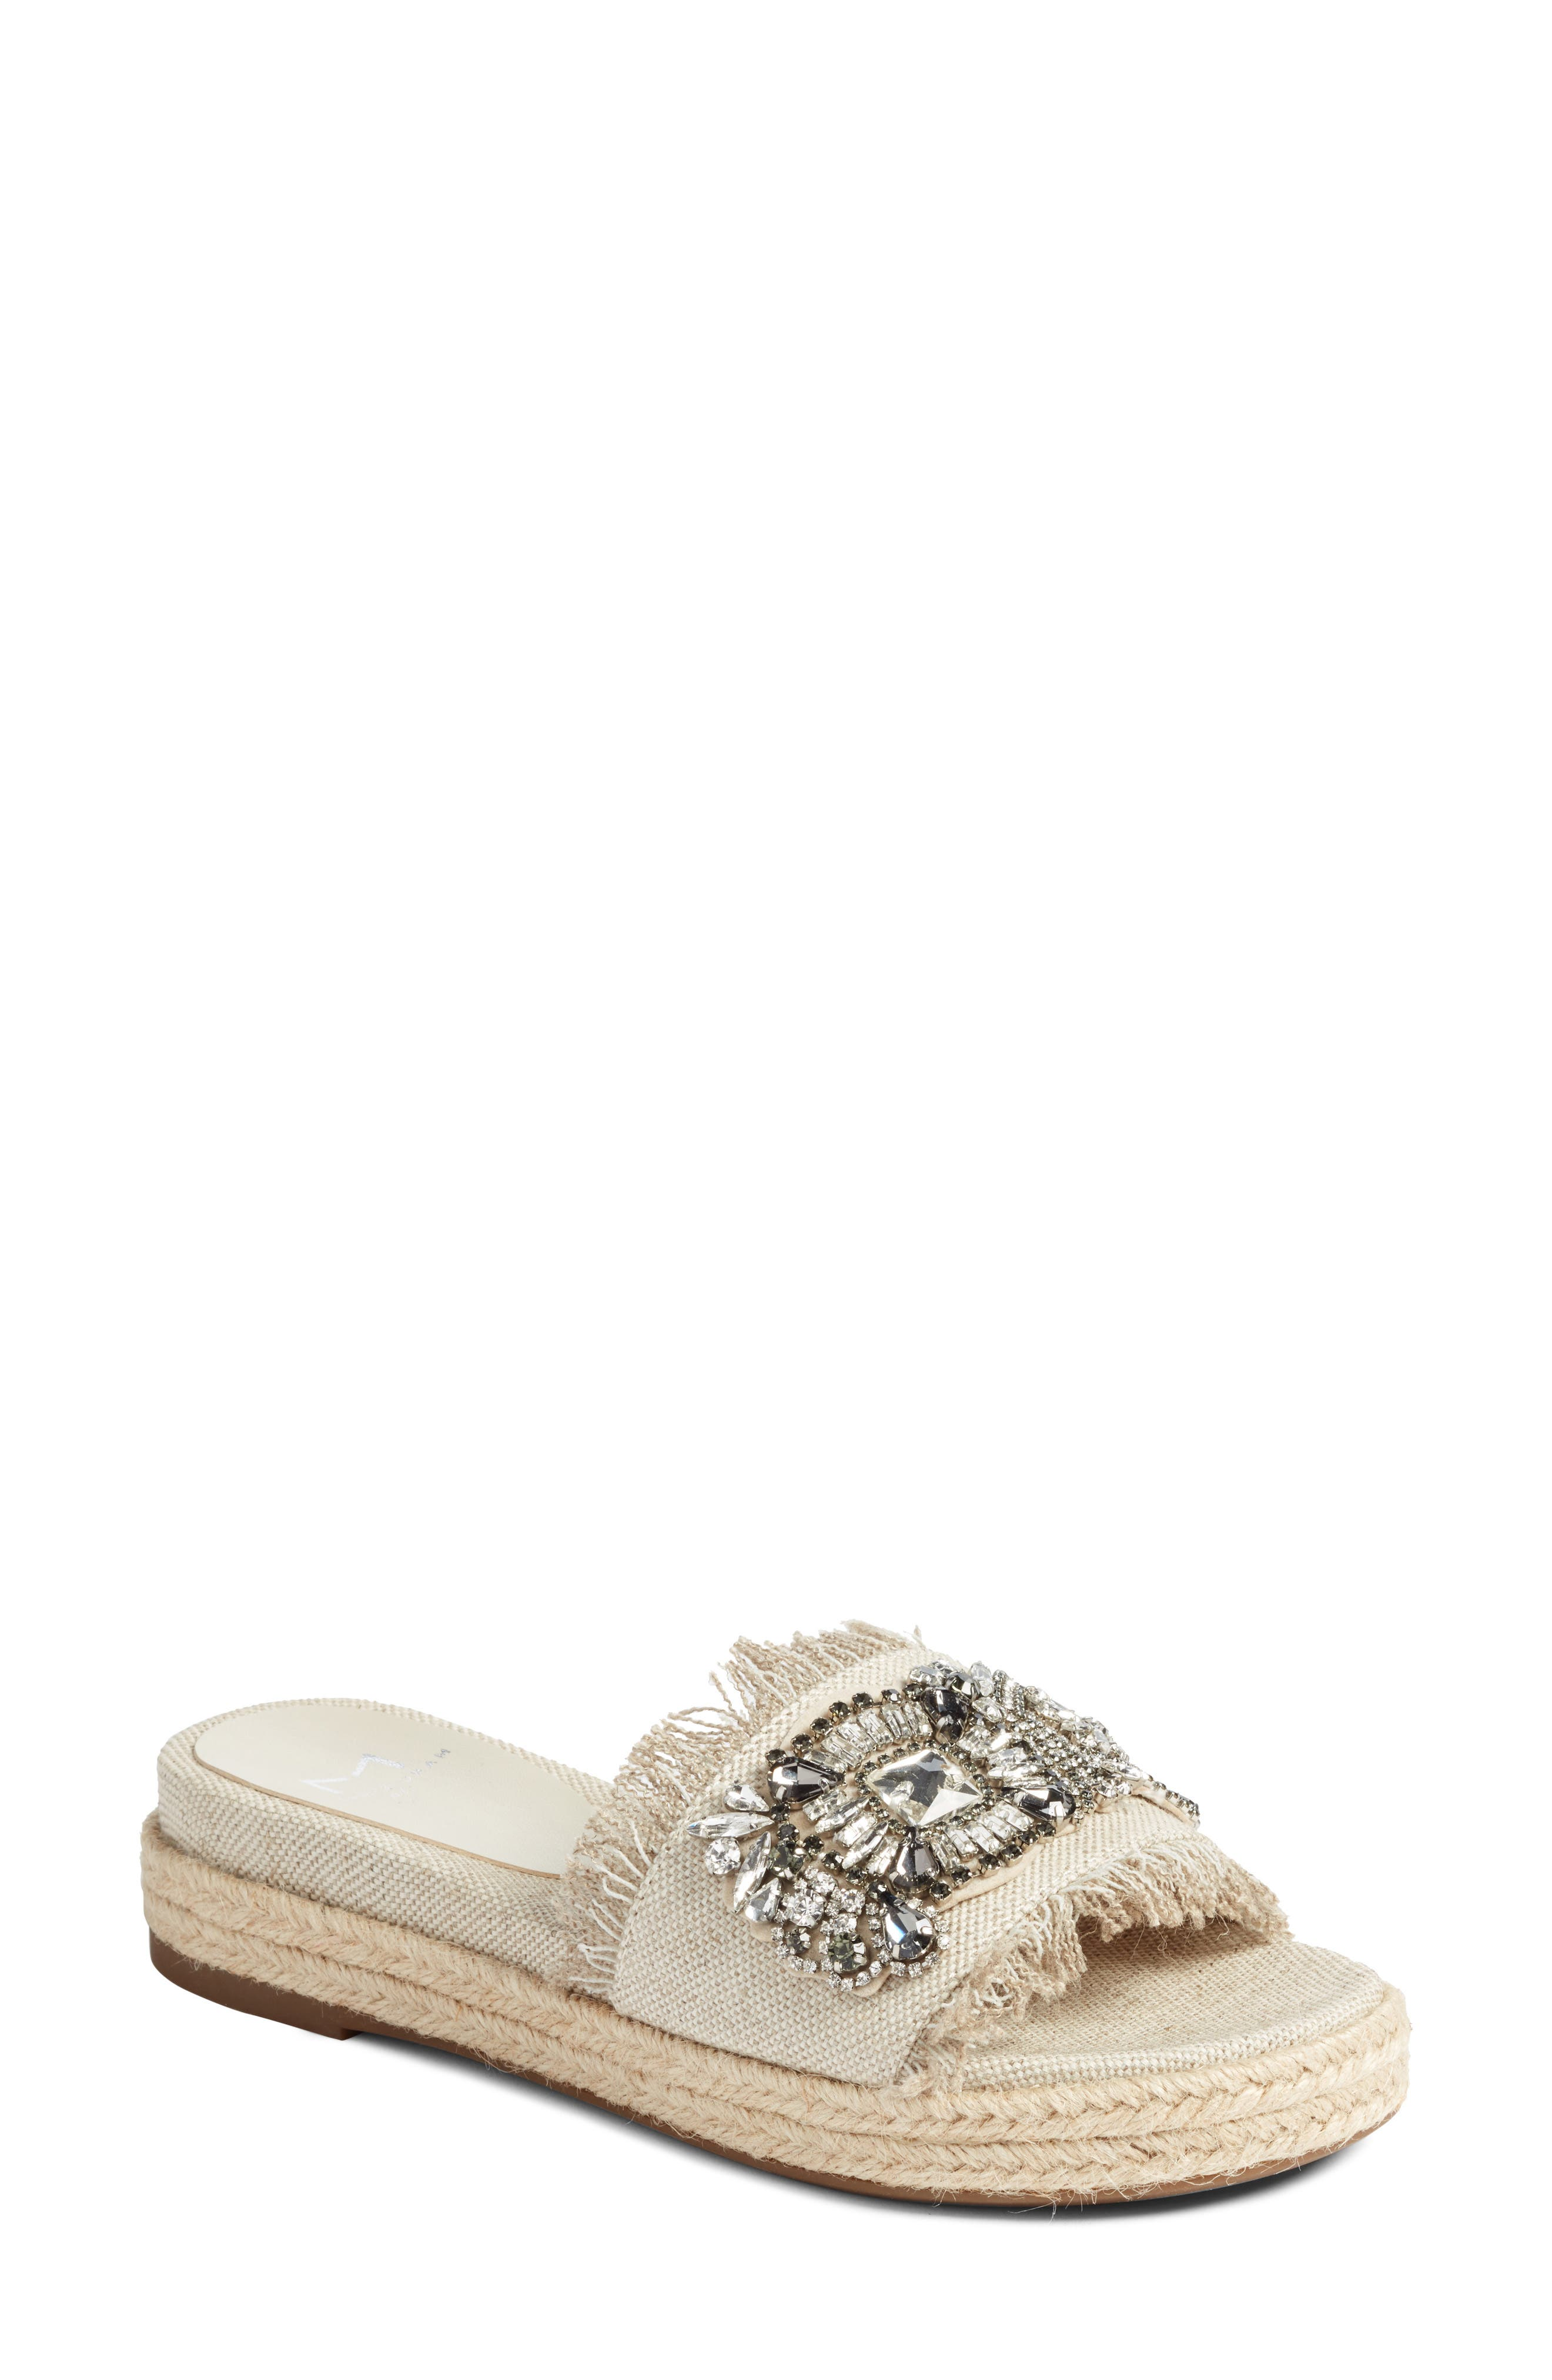 Main Image - Marc Fisher LTD Jelly II Embellished Sandal (Women)